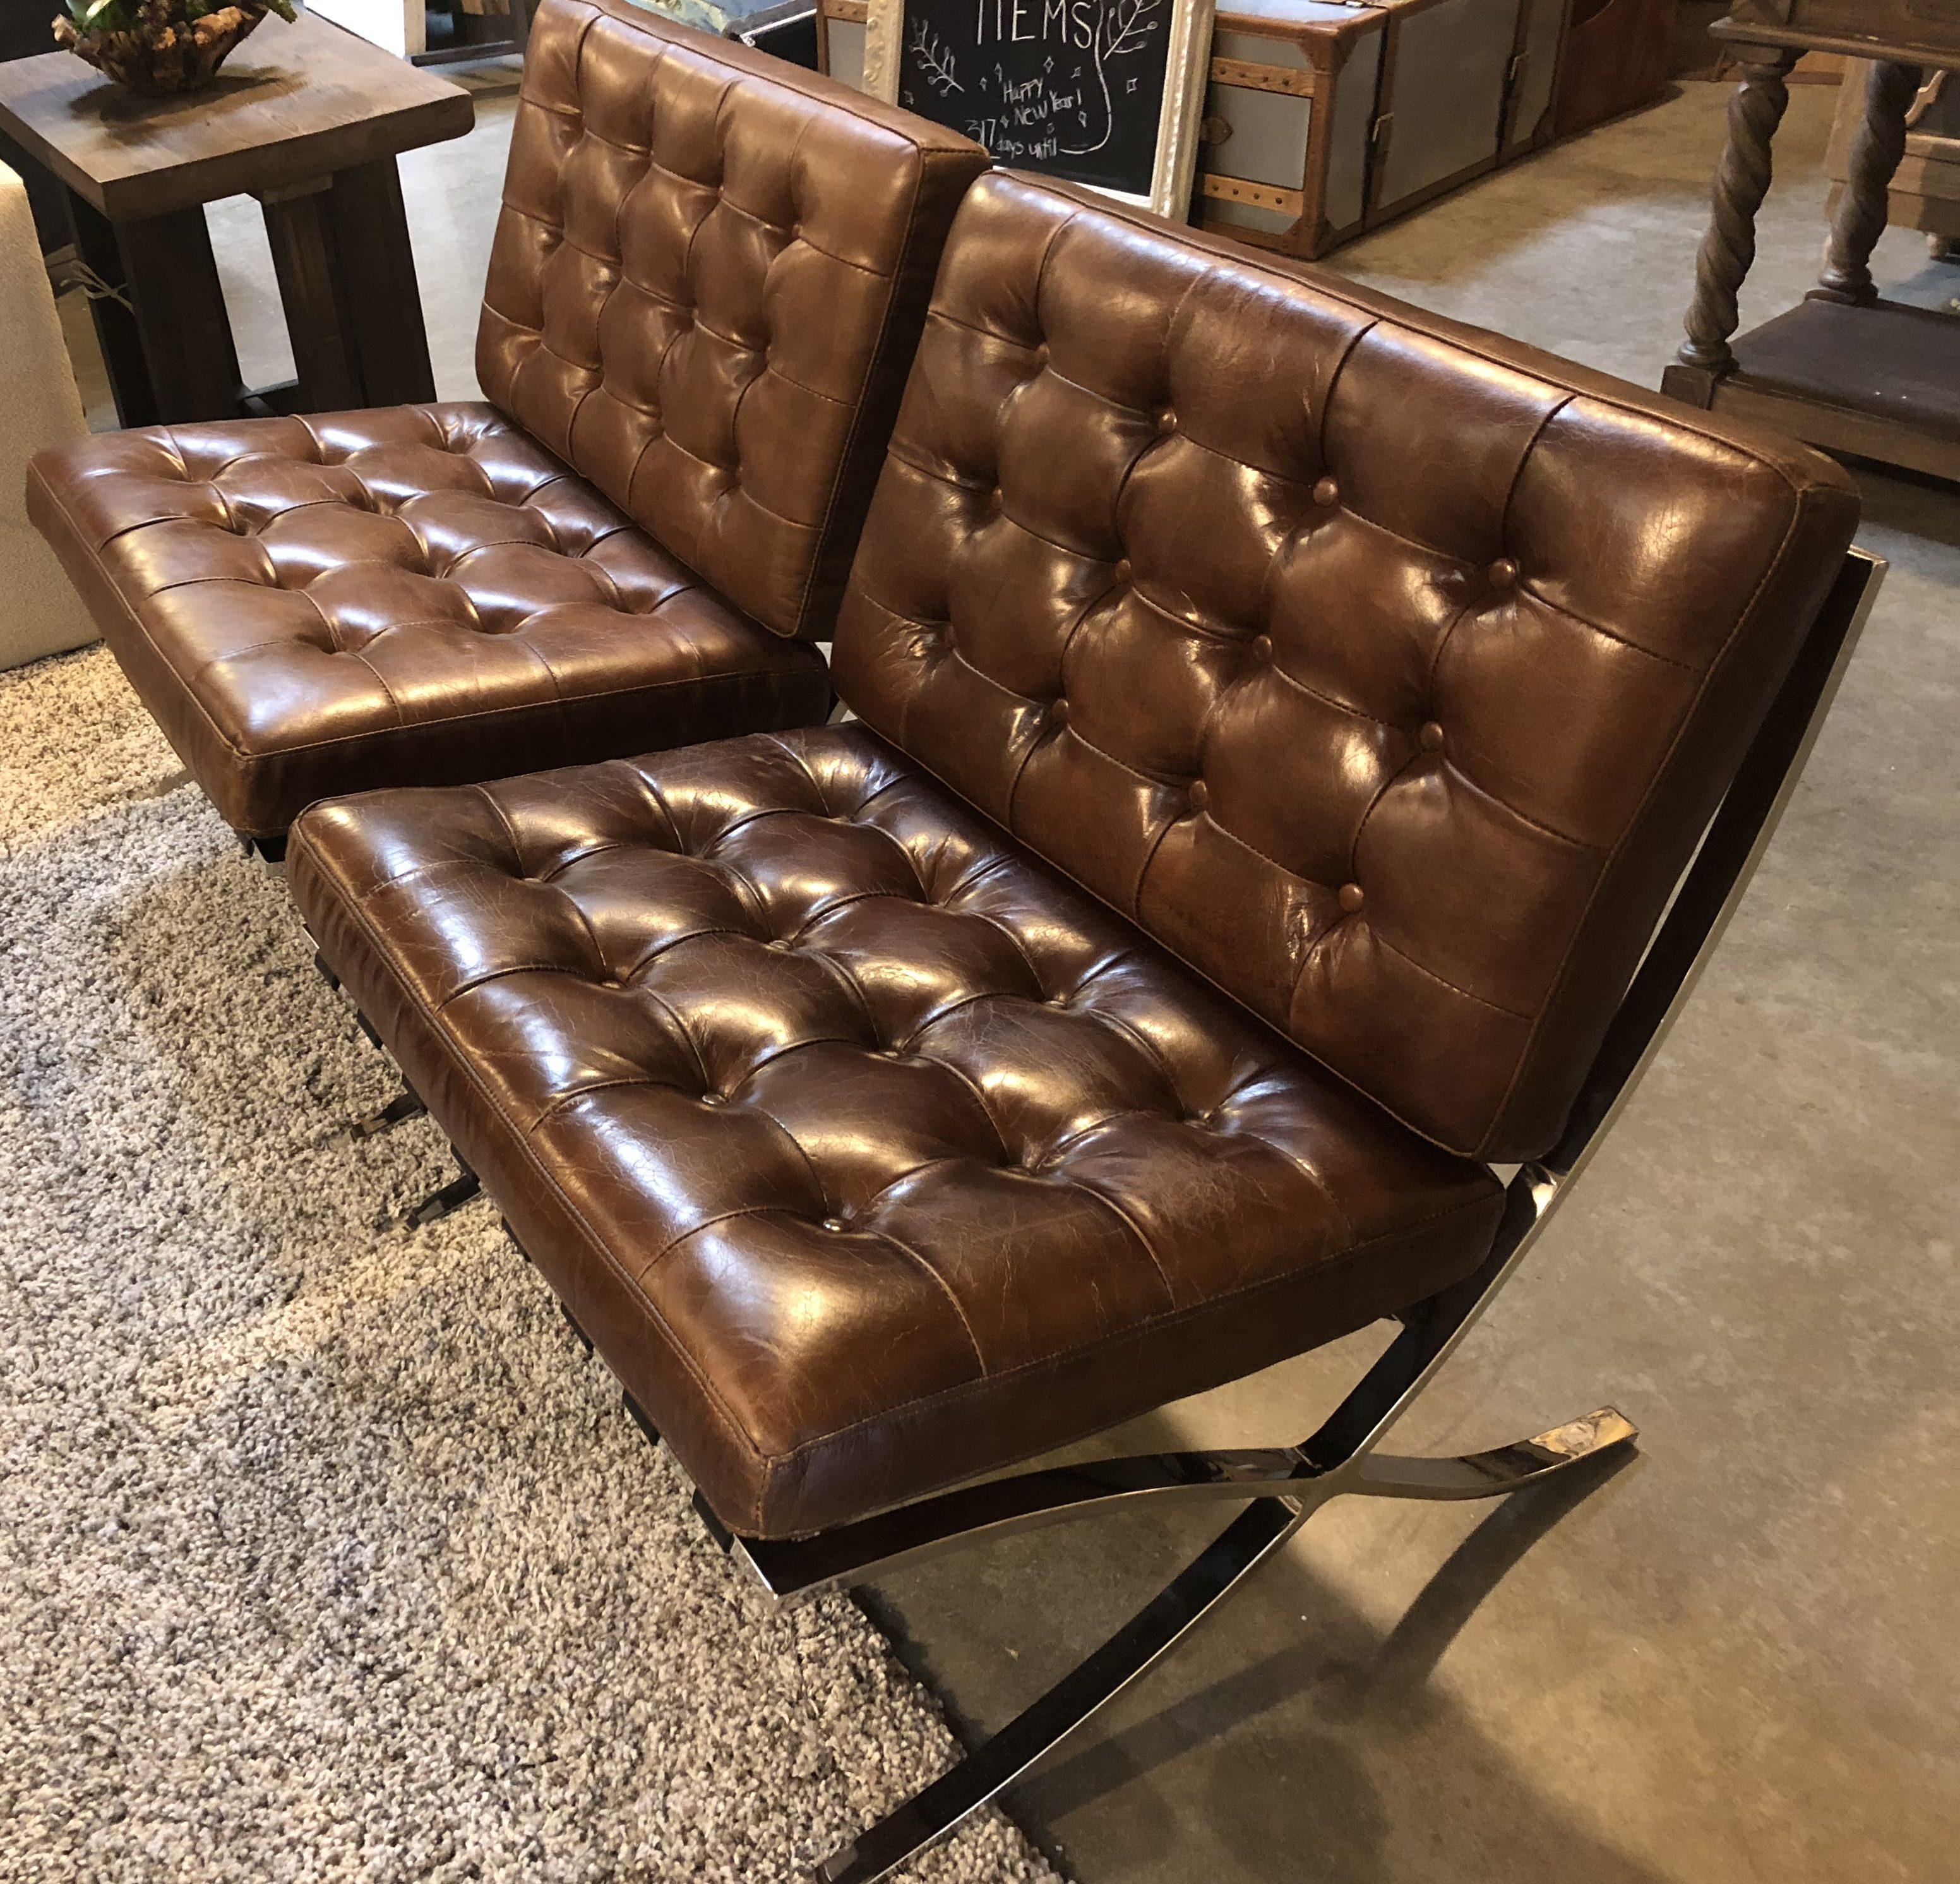 the-find-reno-70s-chic-home-furniture